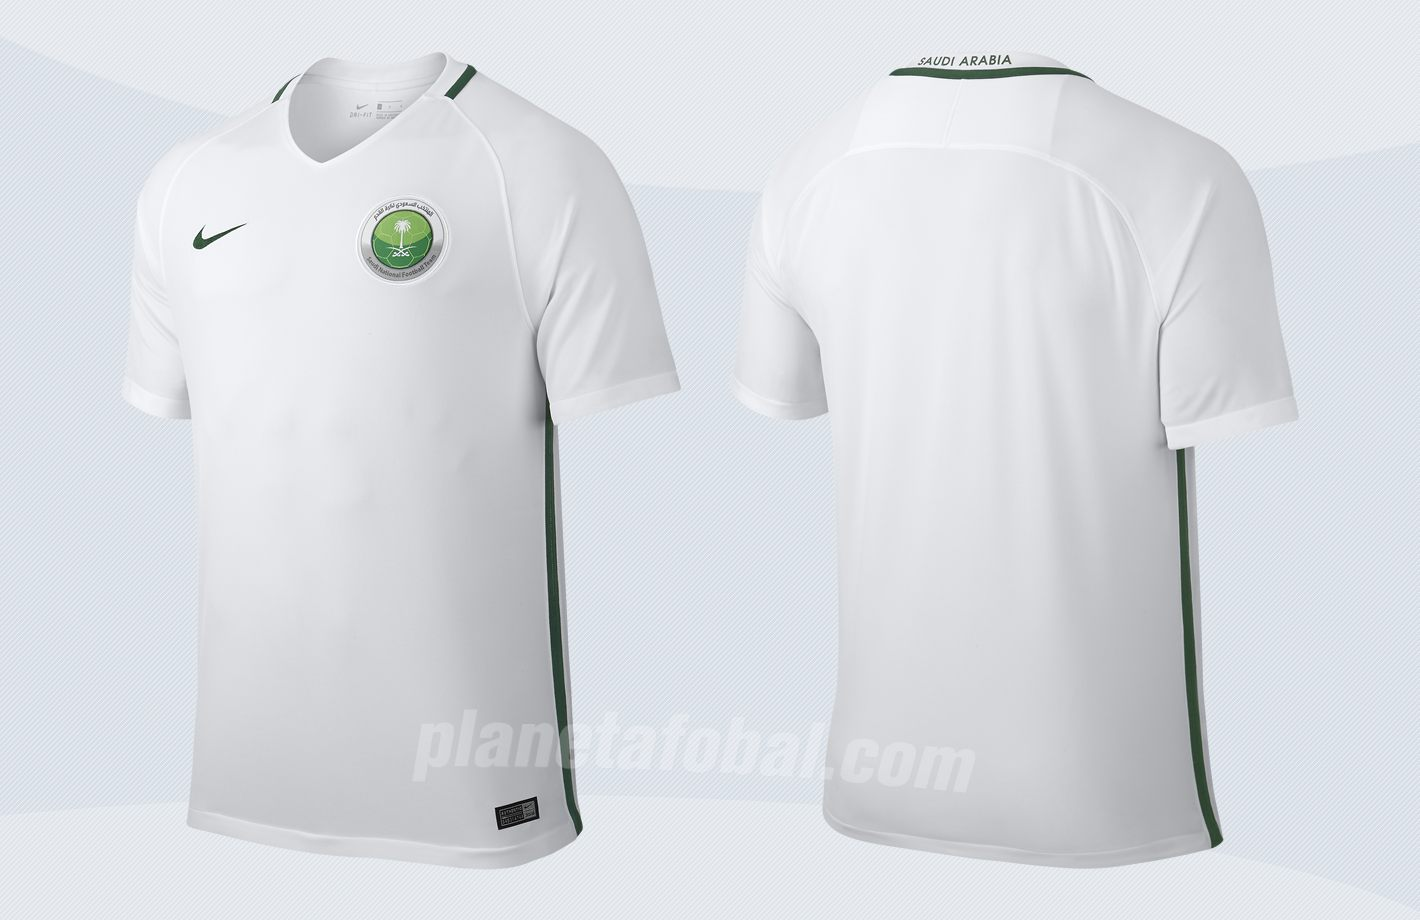 Nueva camiseta de Arabia Saudita | Imágenes Nike